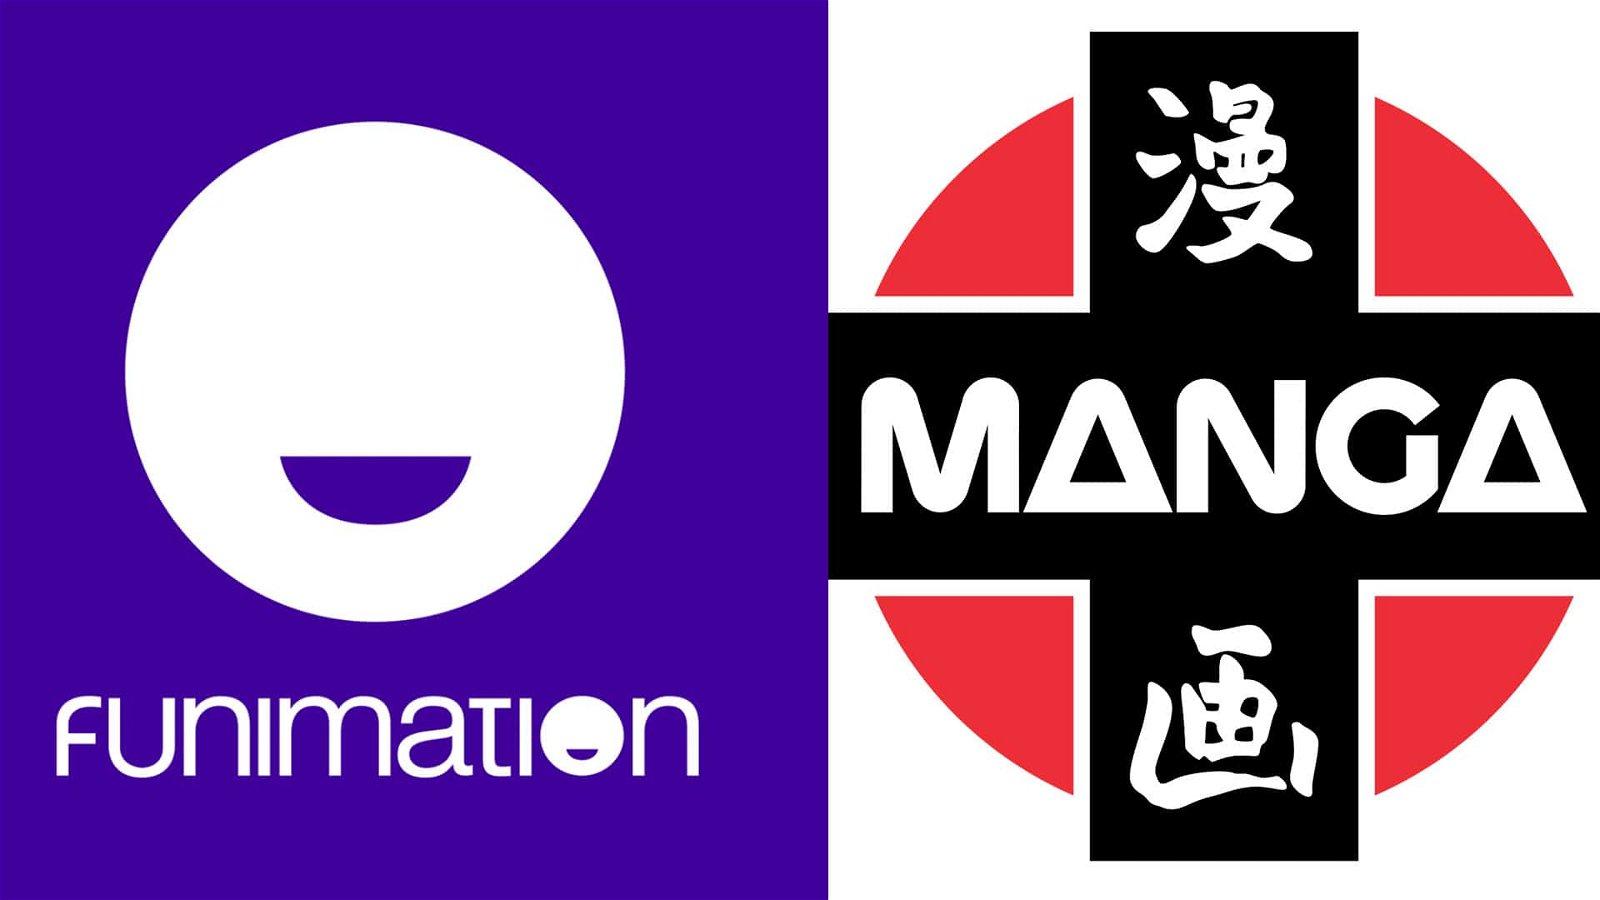 British Anime Distributor Manga Entertainment Acquired by Funimation